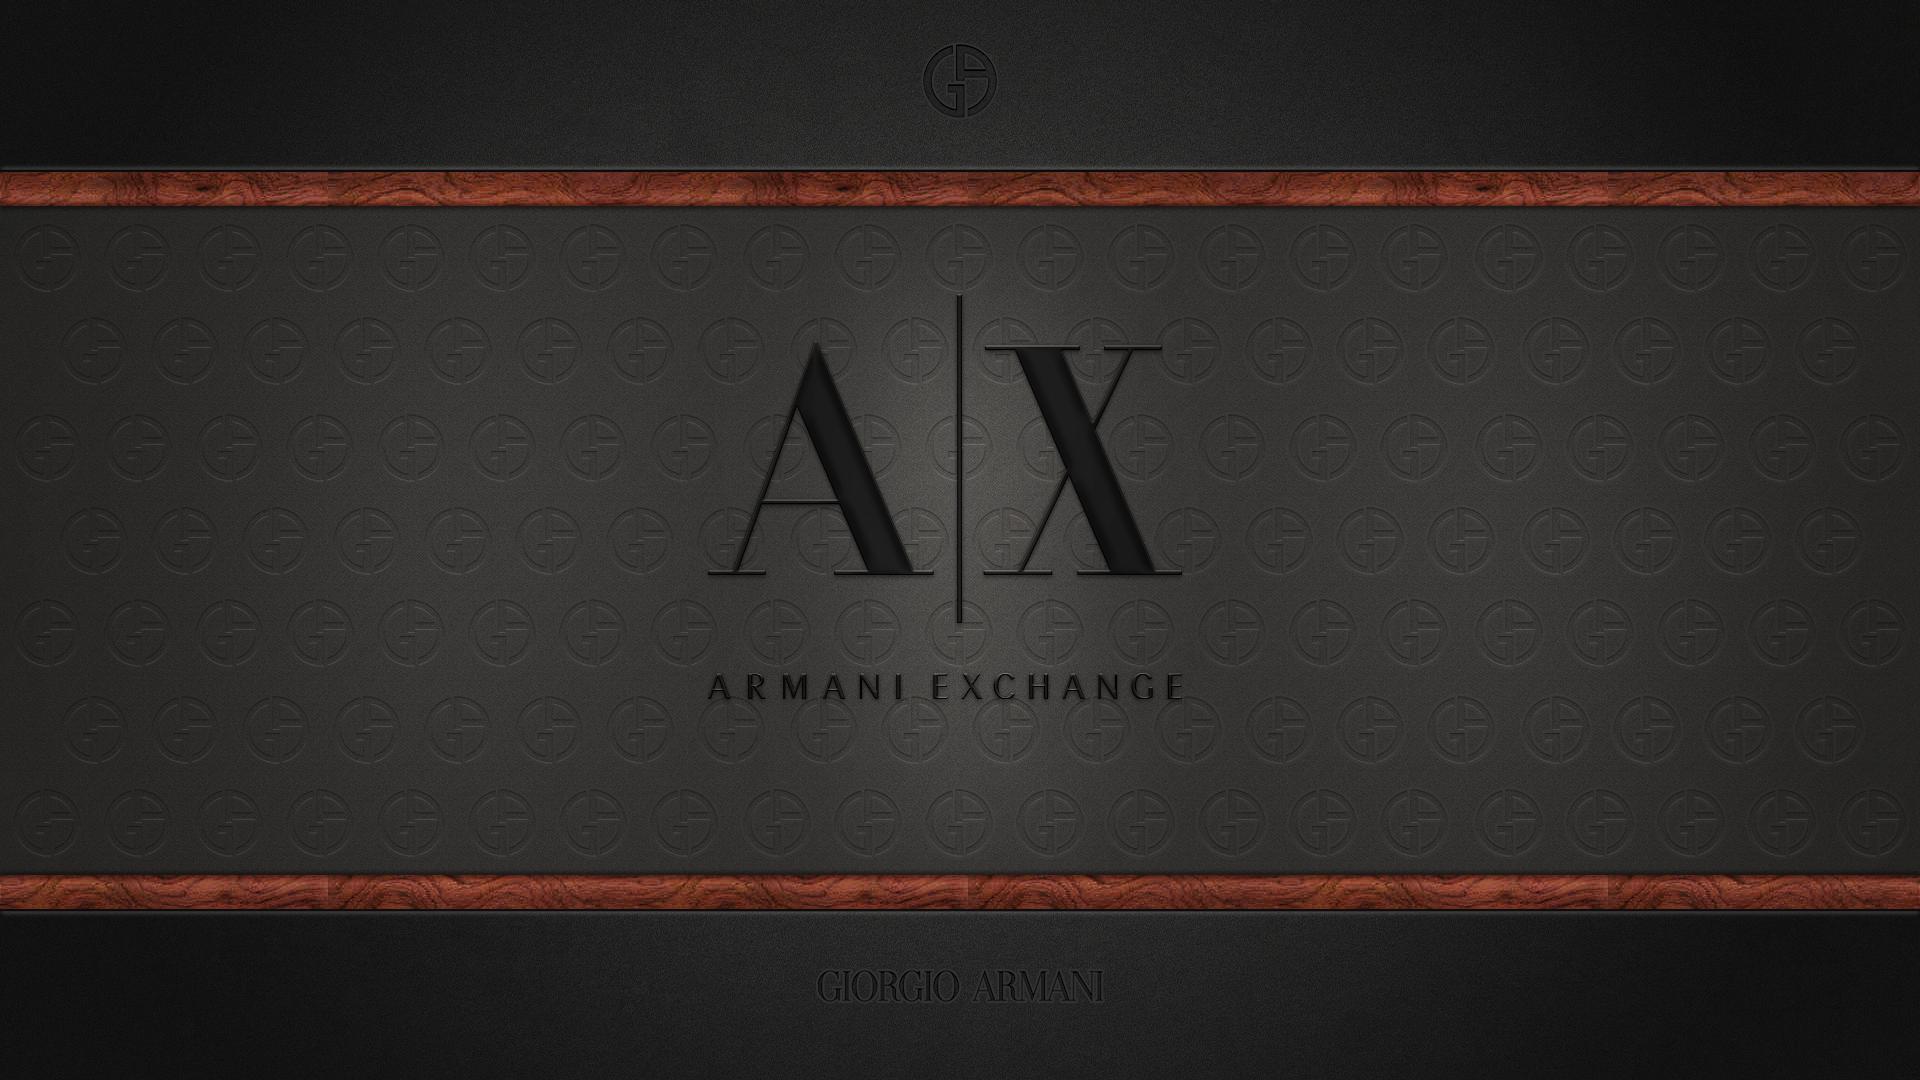 armani exchange logo png wwwpixsharkcom images